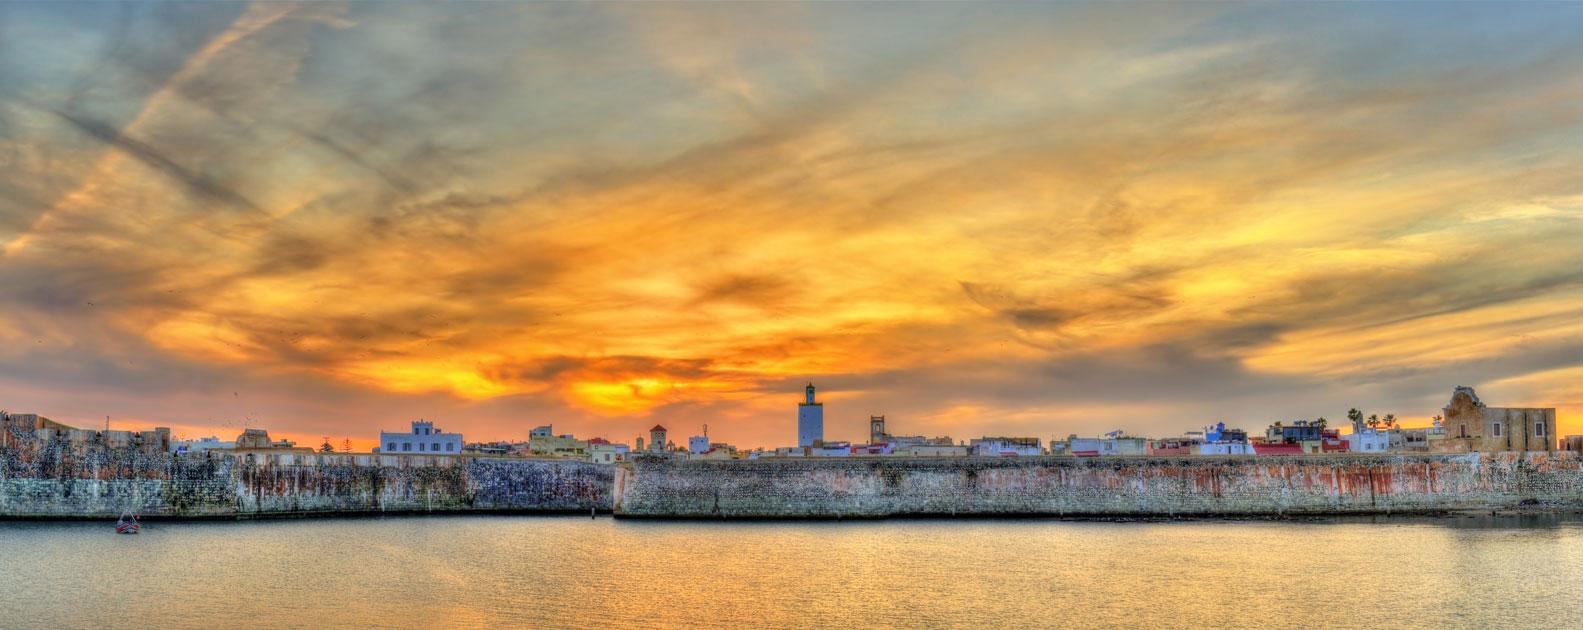 portugueuse-city-mazagan-eljadida.jpg